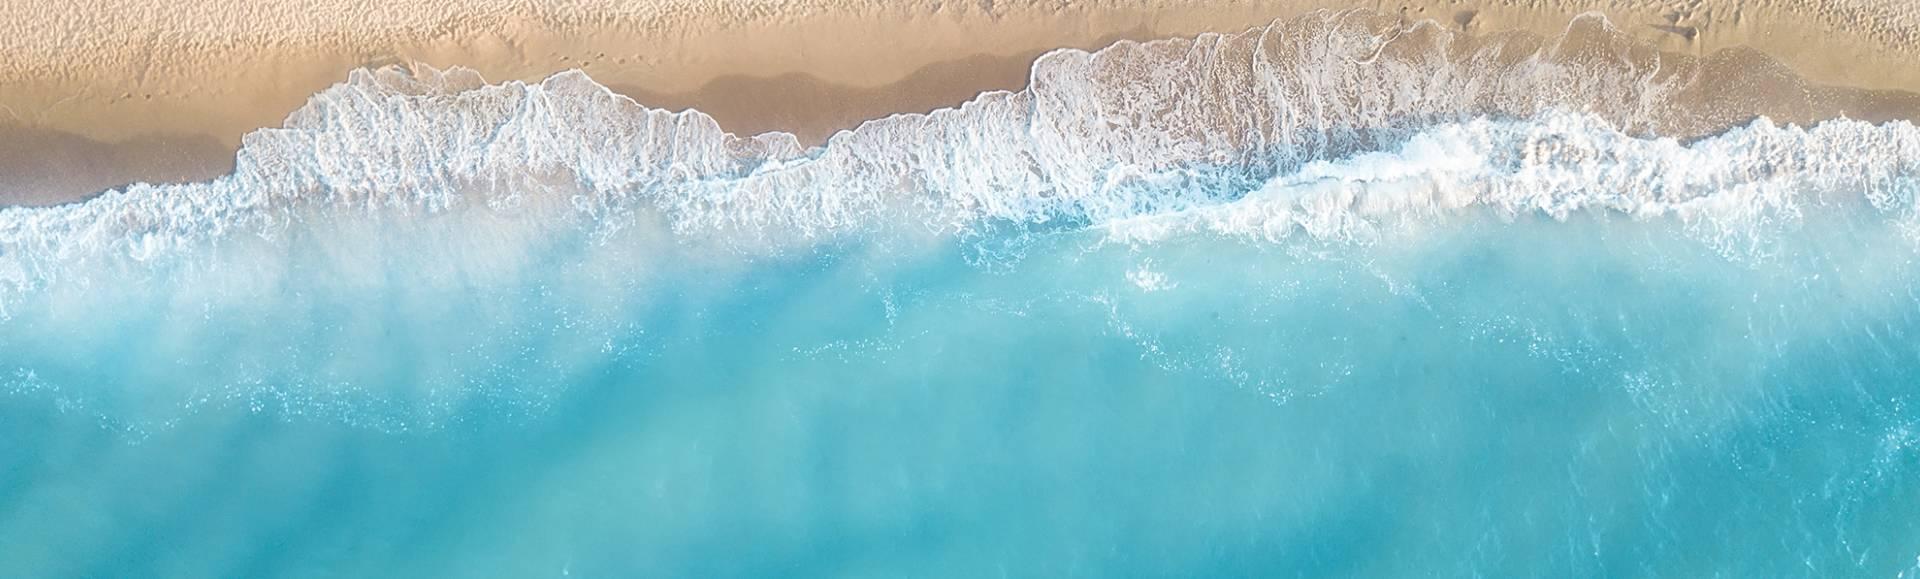 bandeau_mer_sable_turquoise